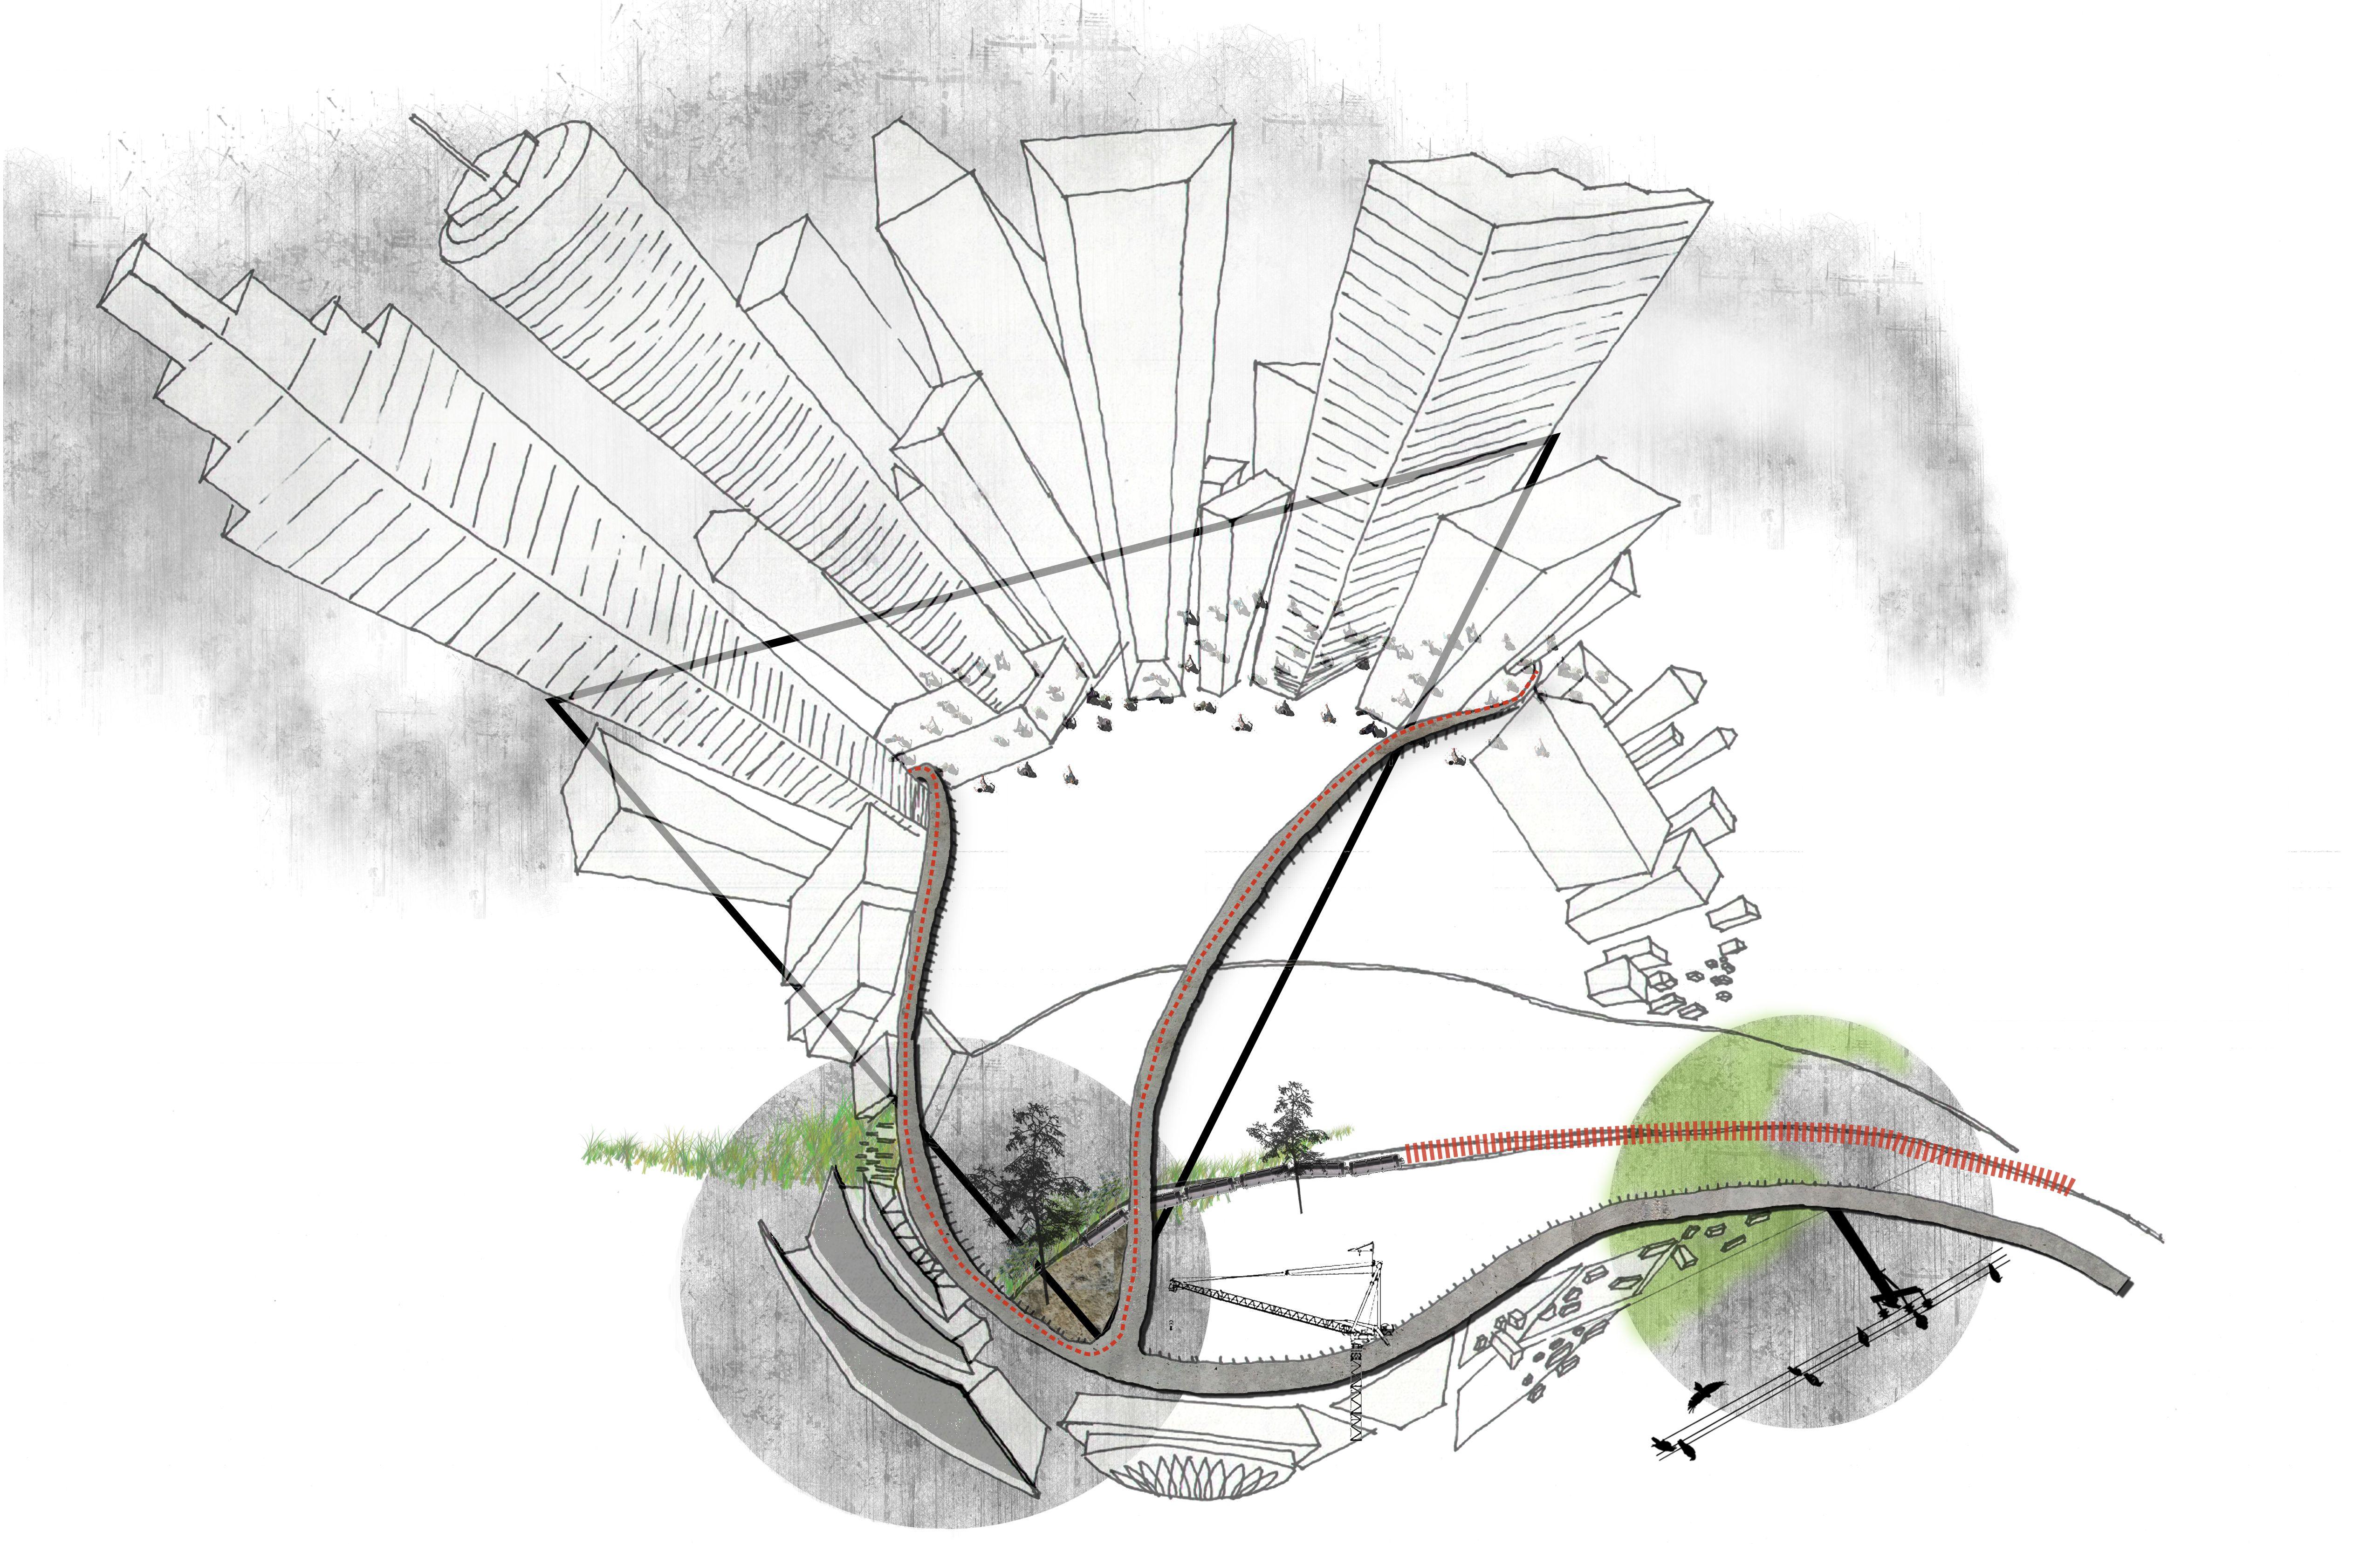 phenomenologie diagramme - Buscar con Google